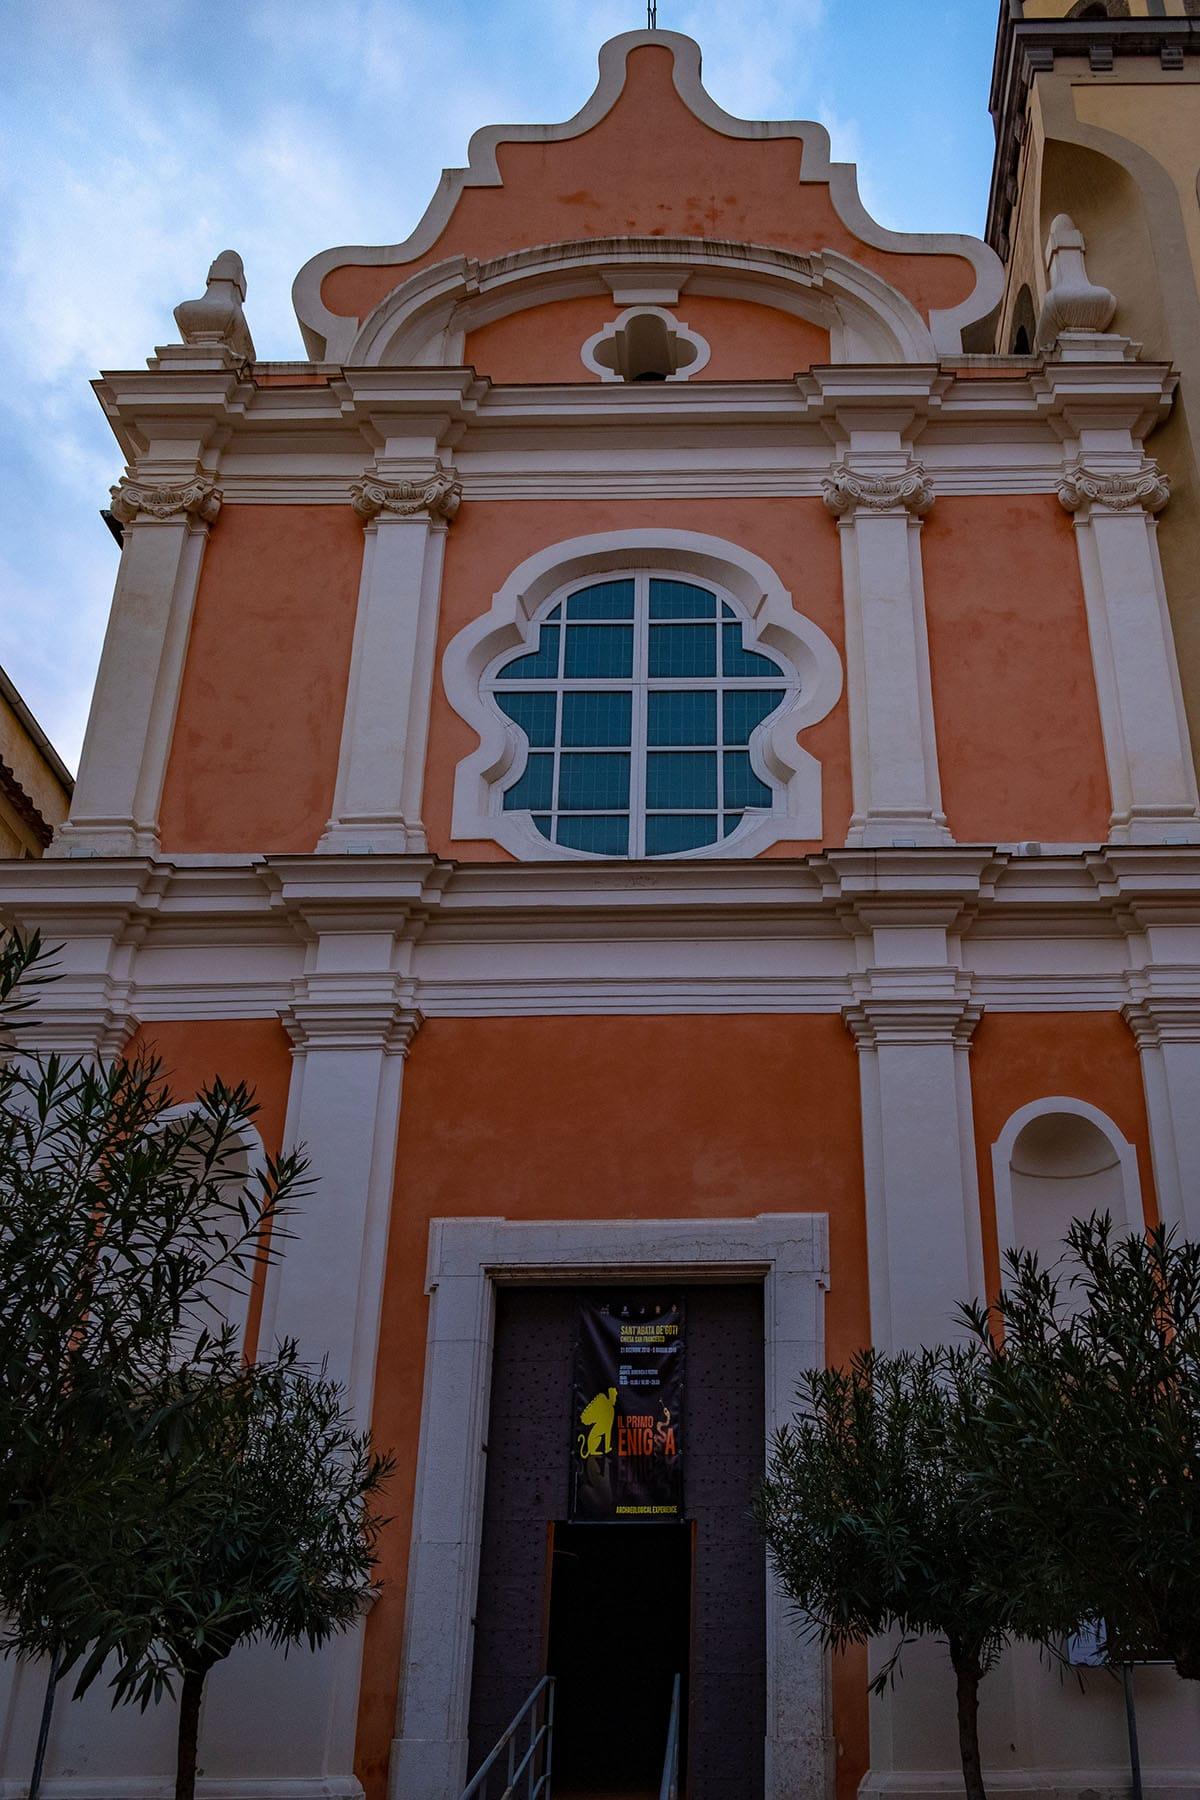 Chiesa San Francesco Sant'Agata de'Goti